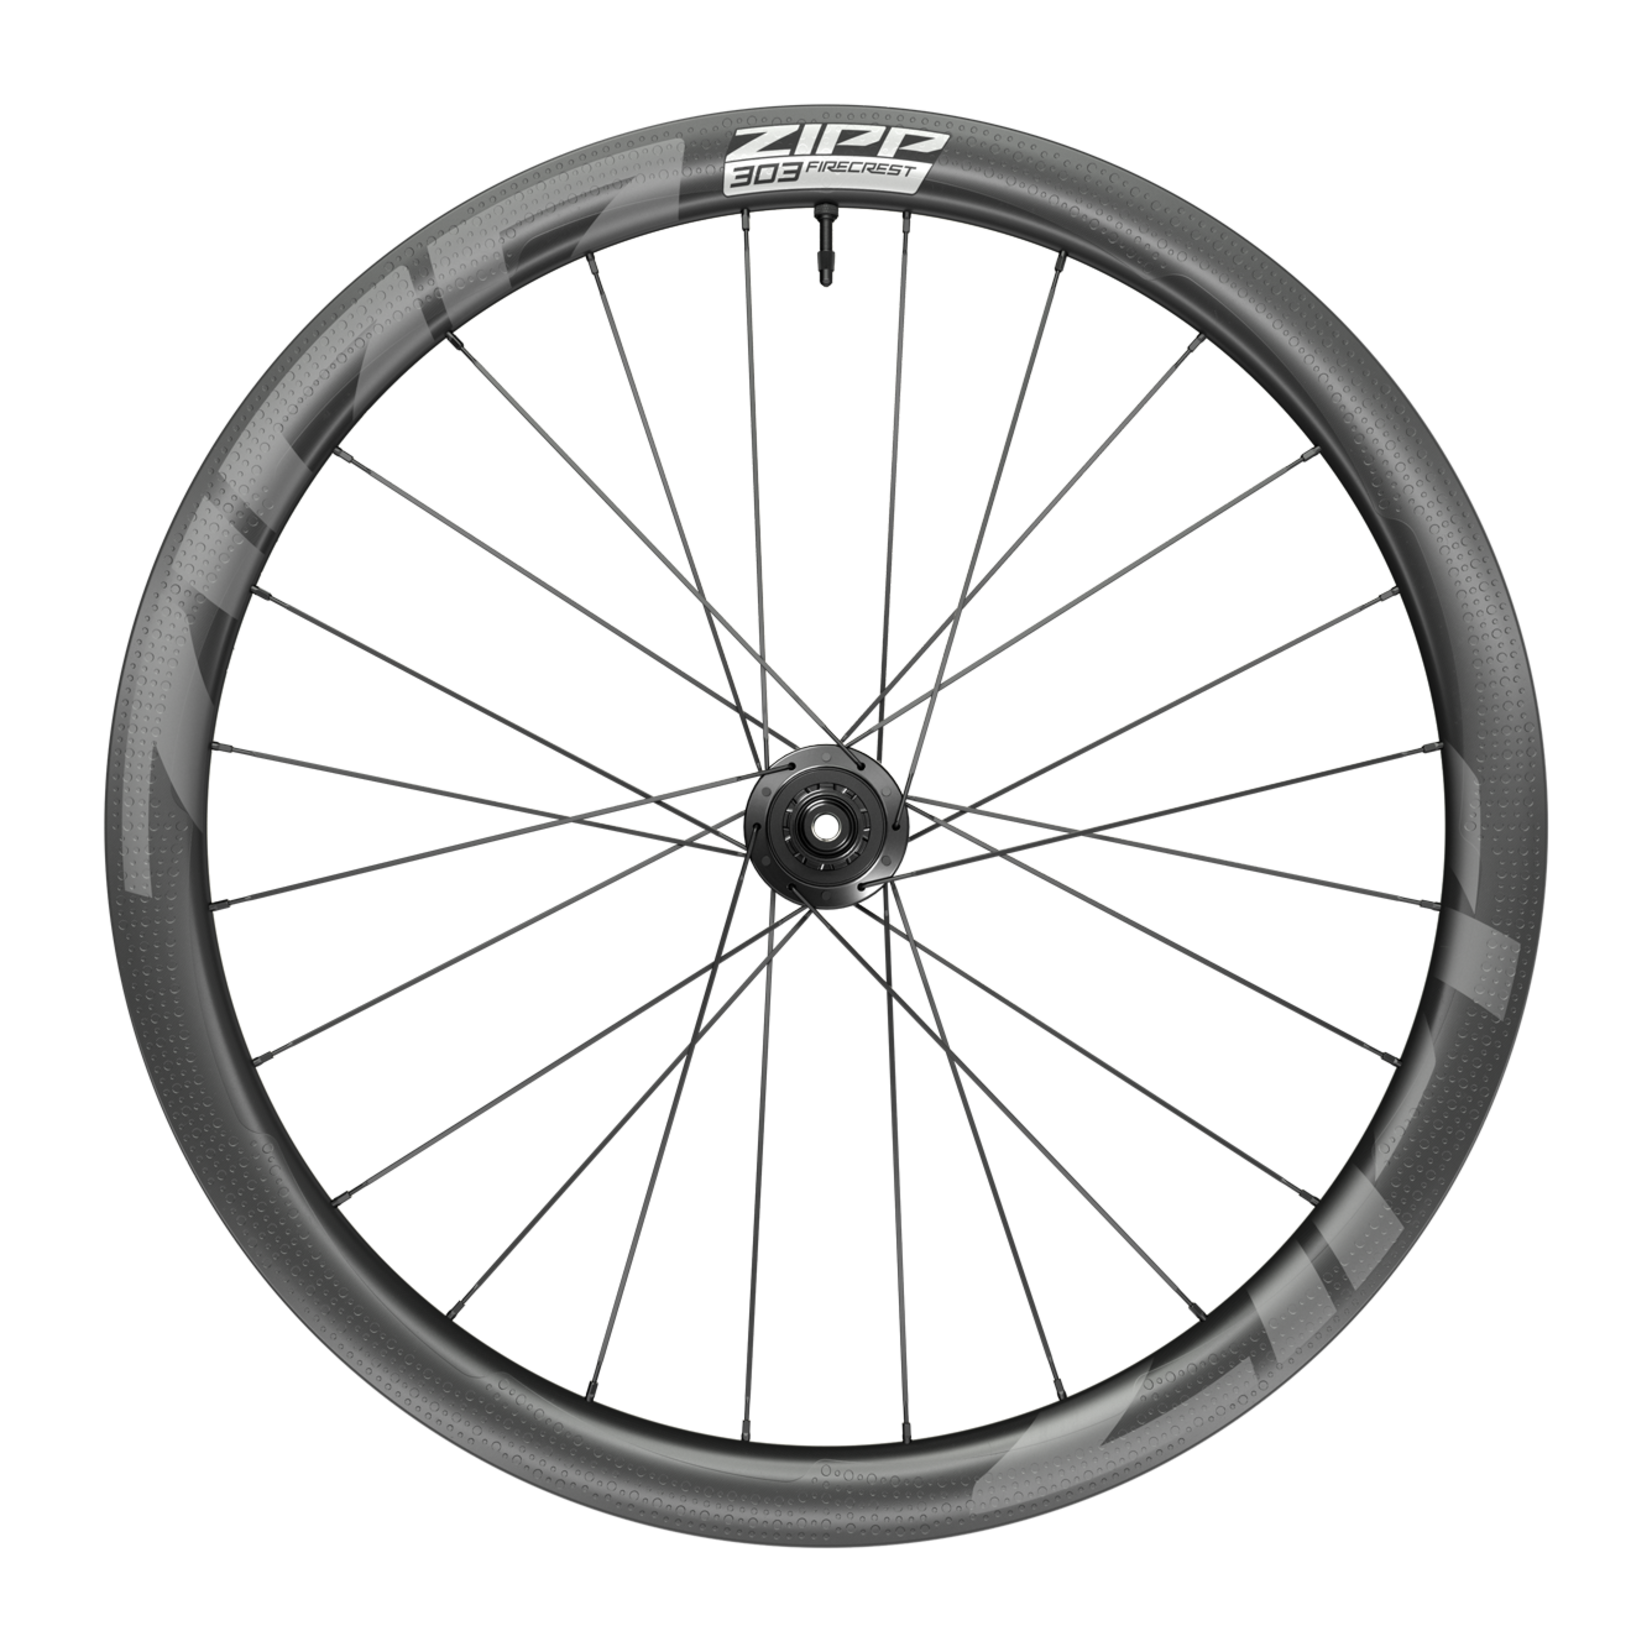 Zipp 303 Front Wheel Disc Brake